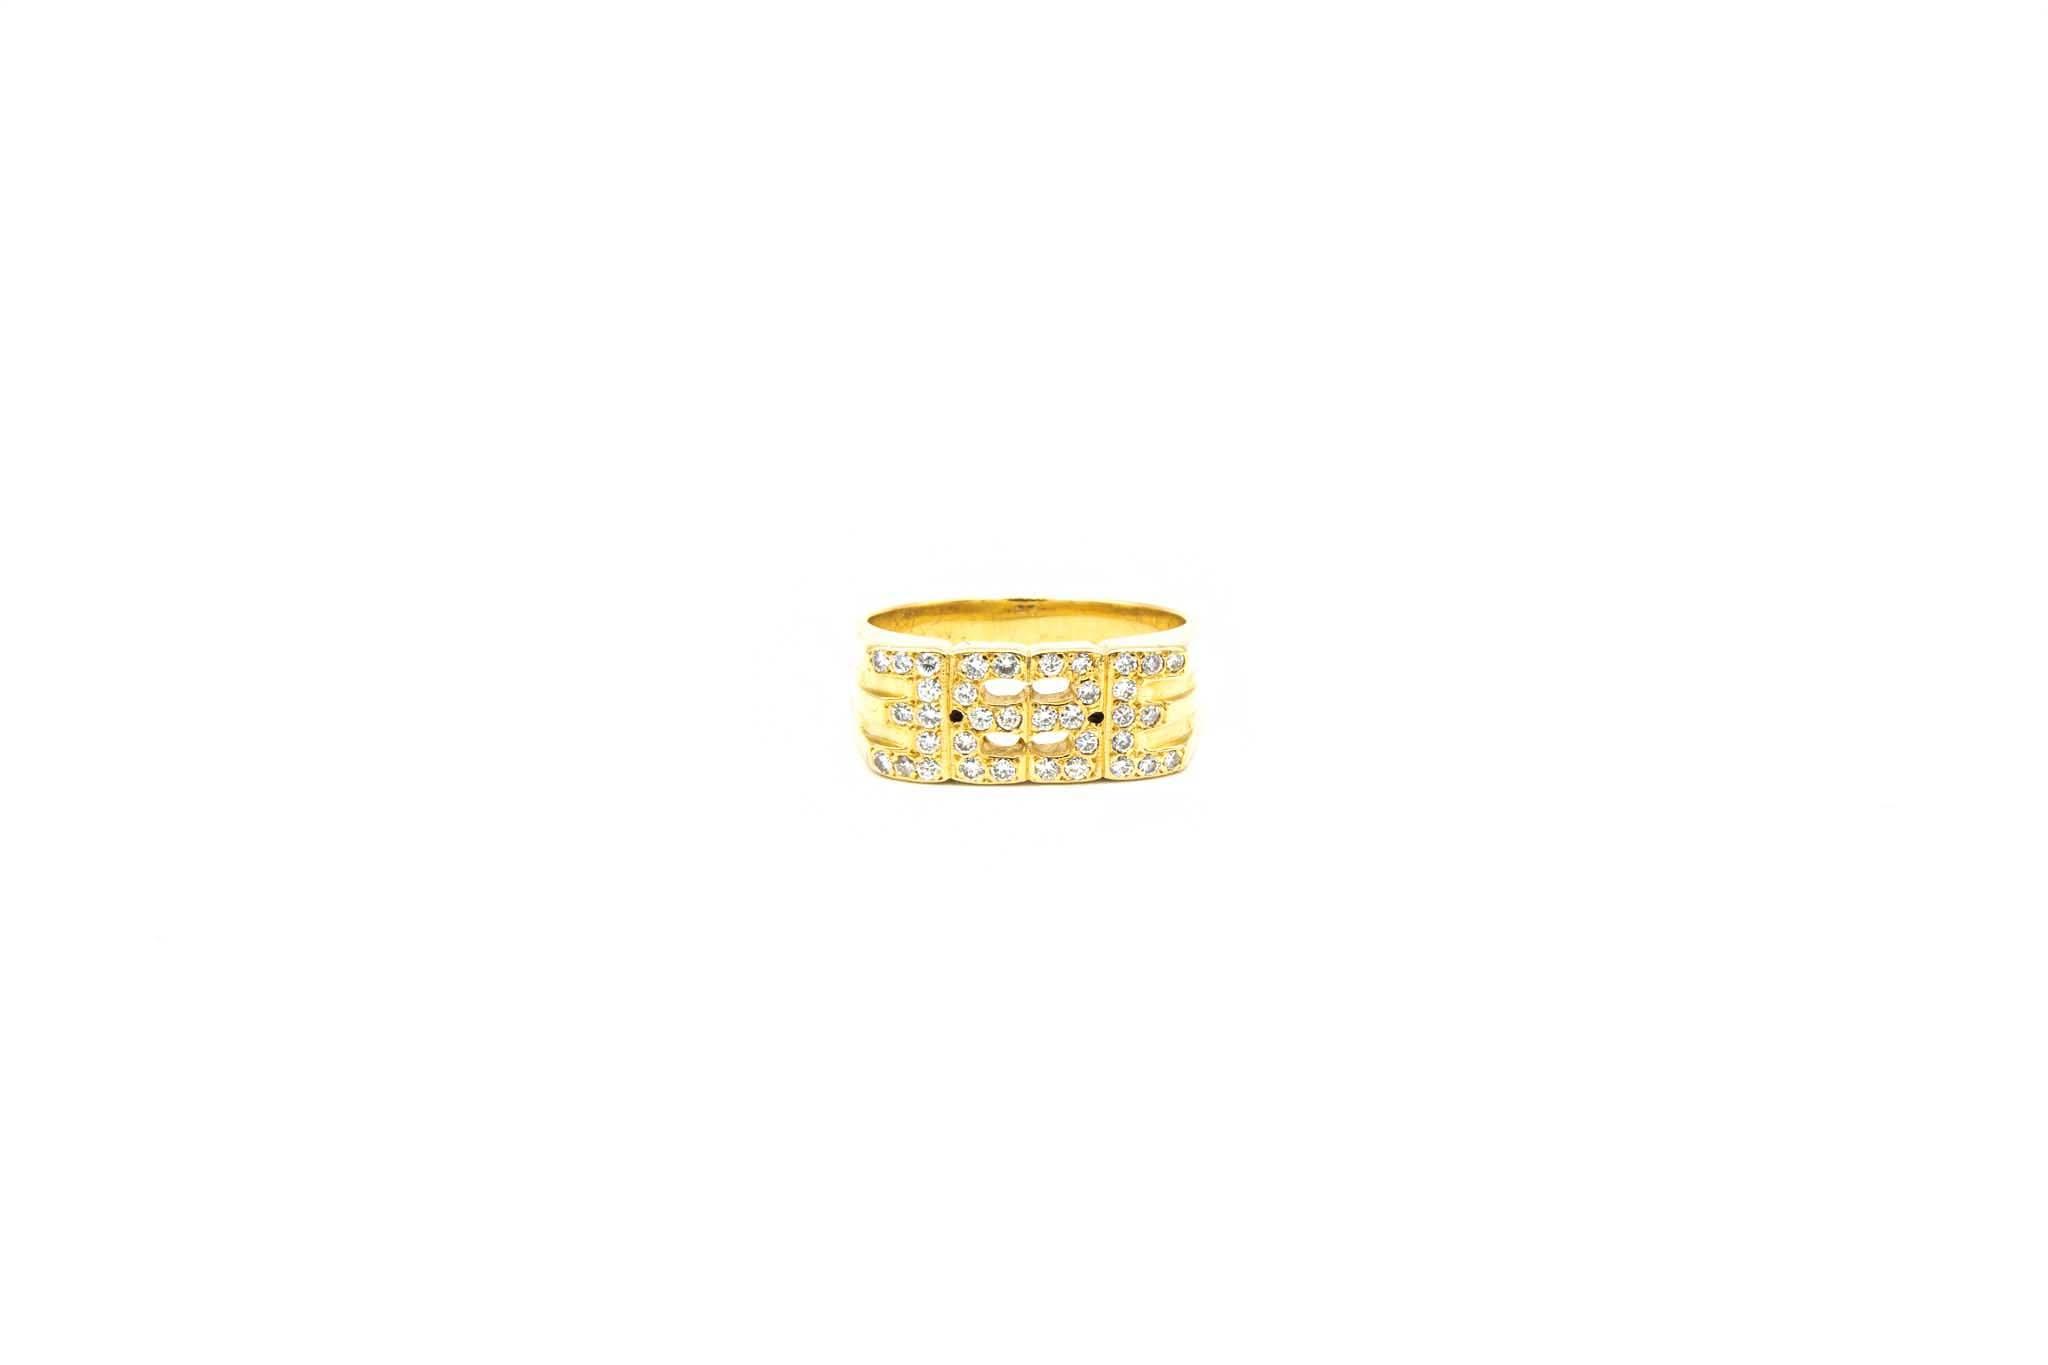 Ring fantasie opengewerkt met diamant-1